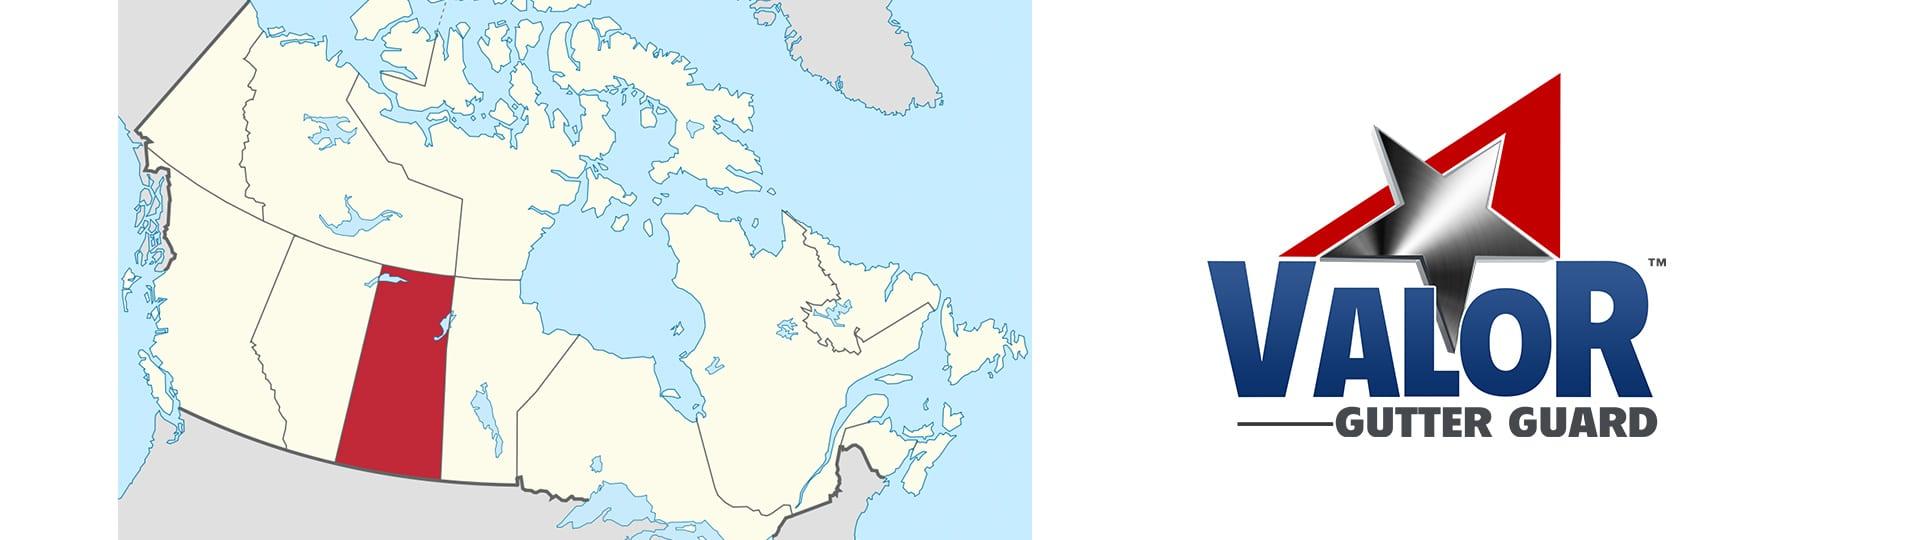 SaskatchewanCanadaHeader1910